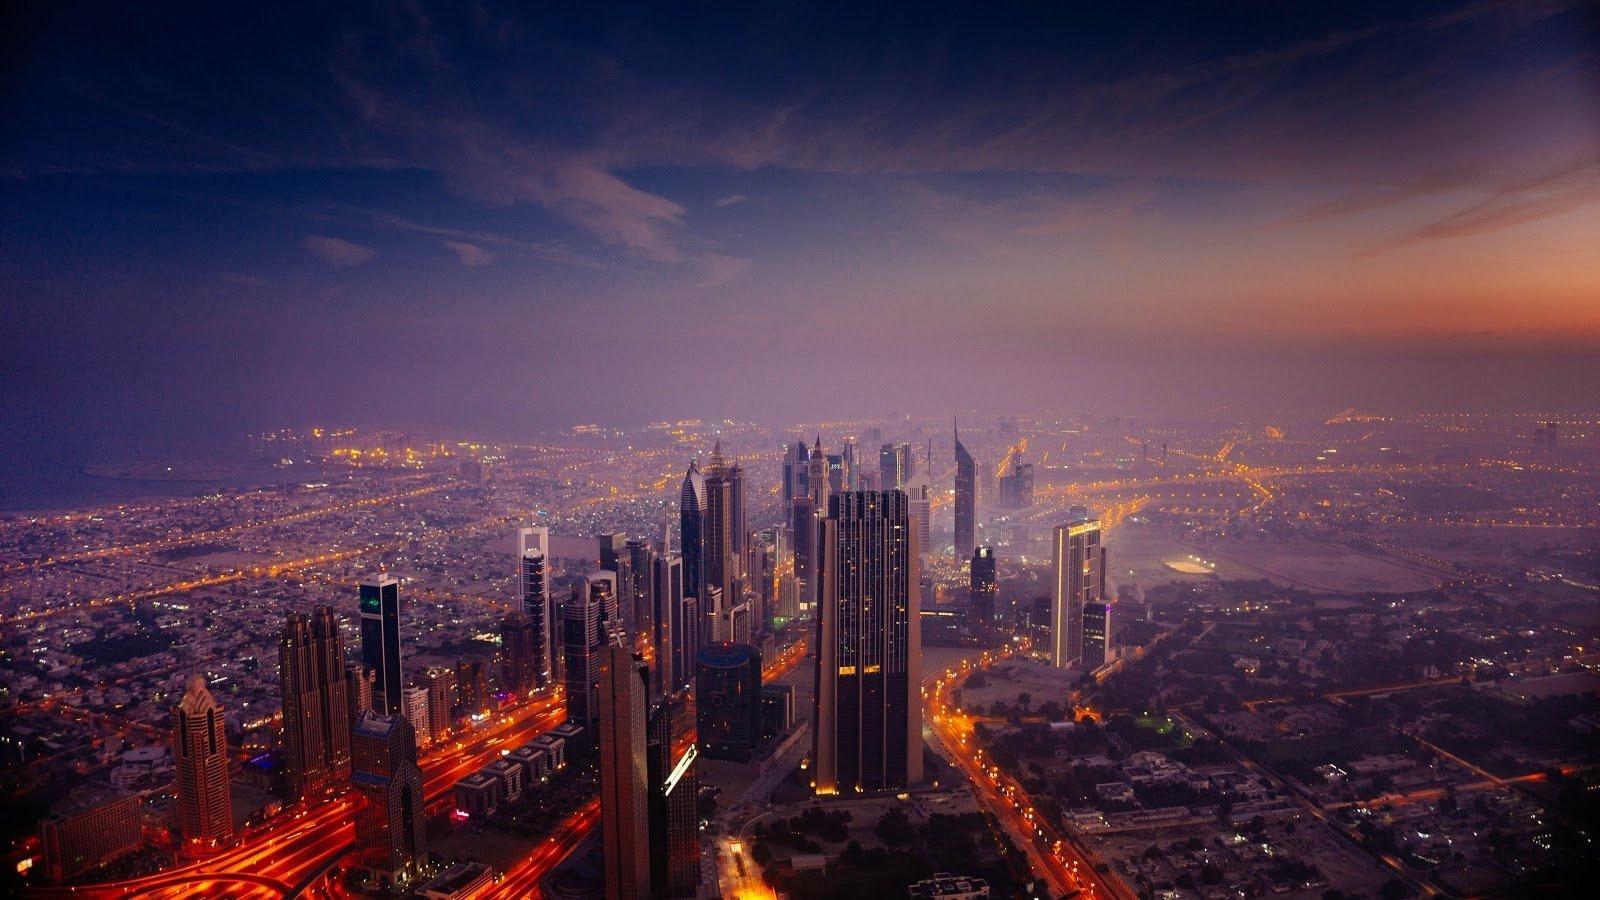 cityscape-photography-piotr-chrobot